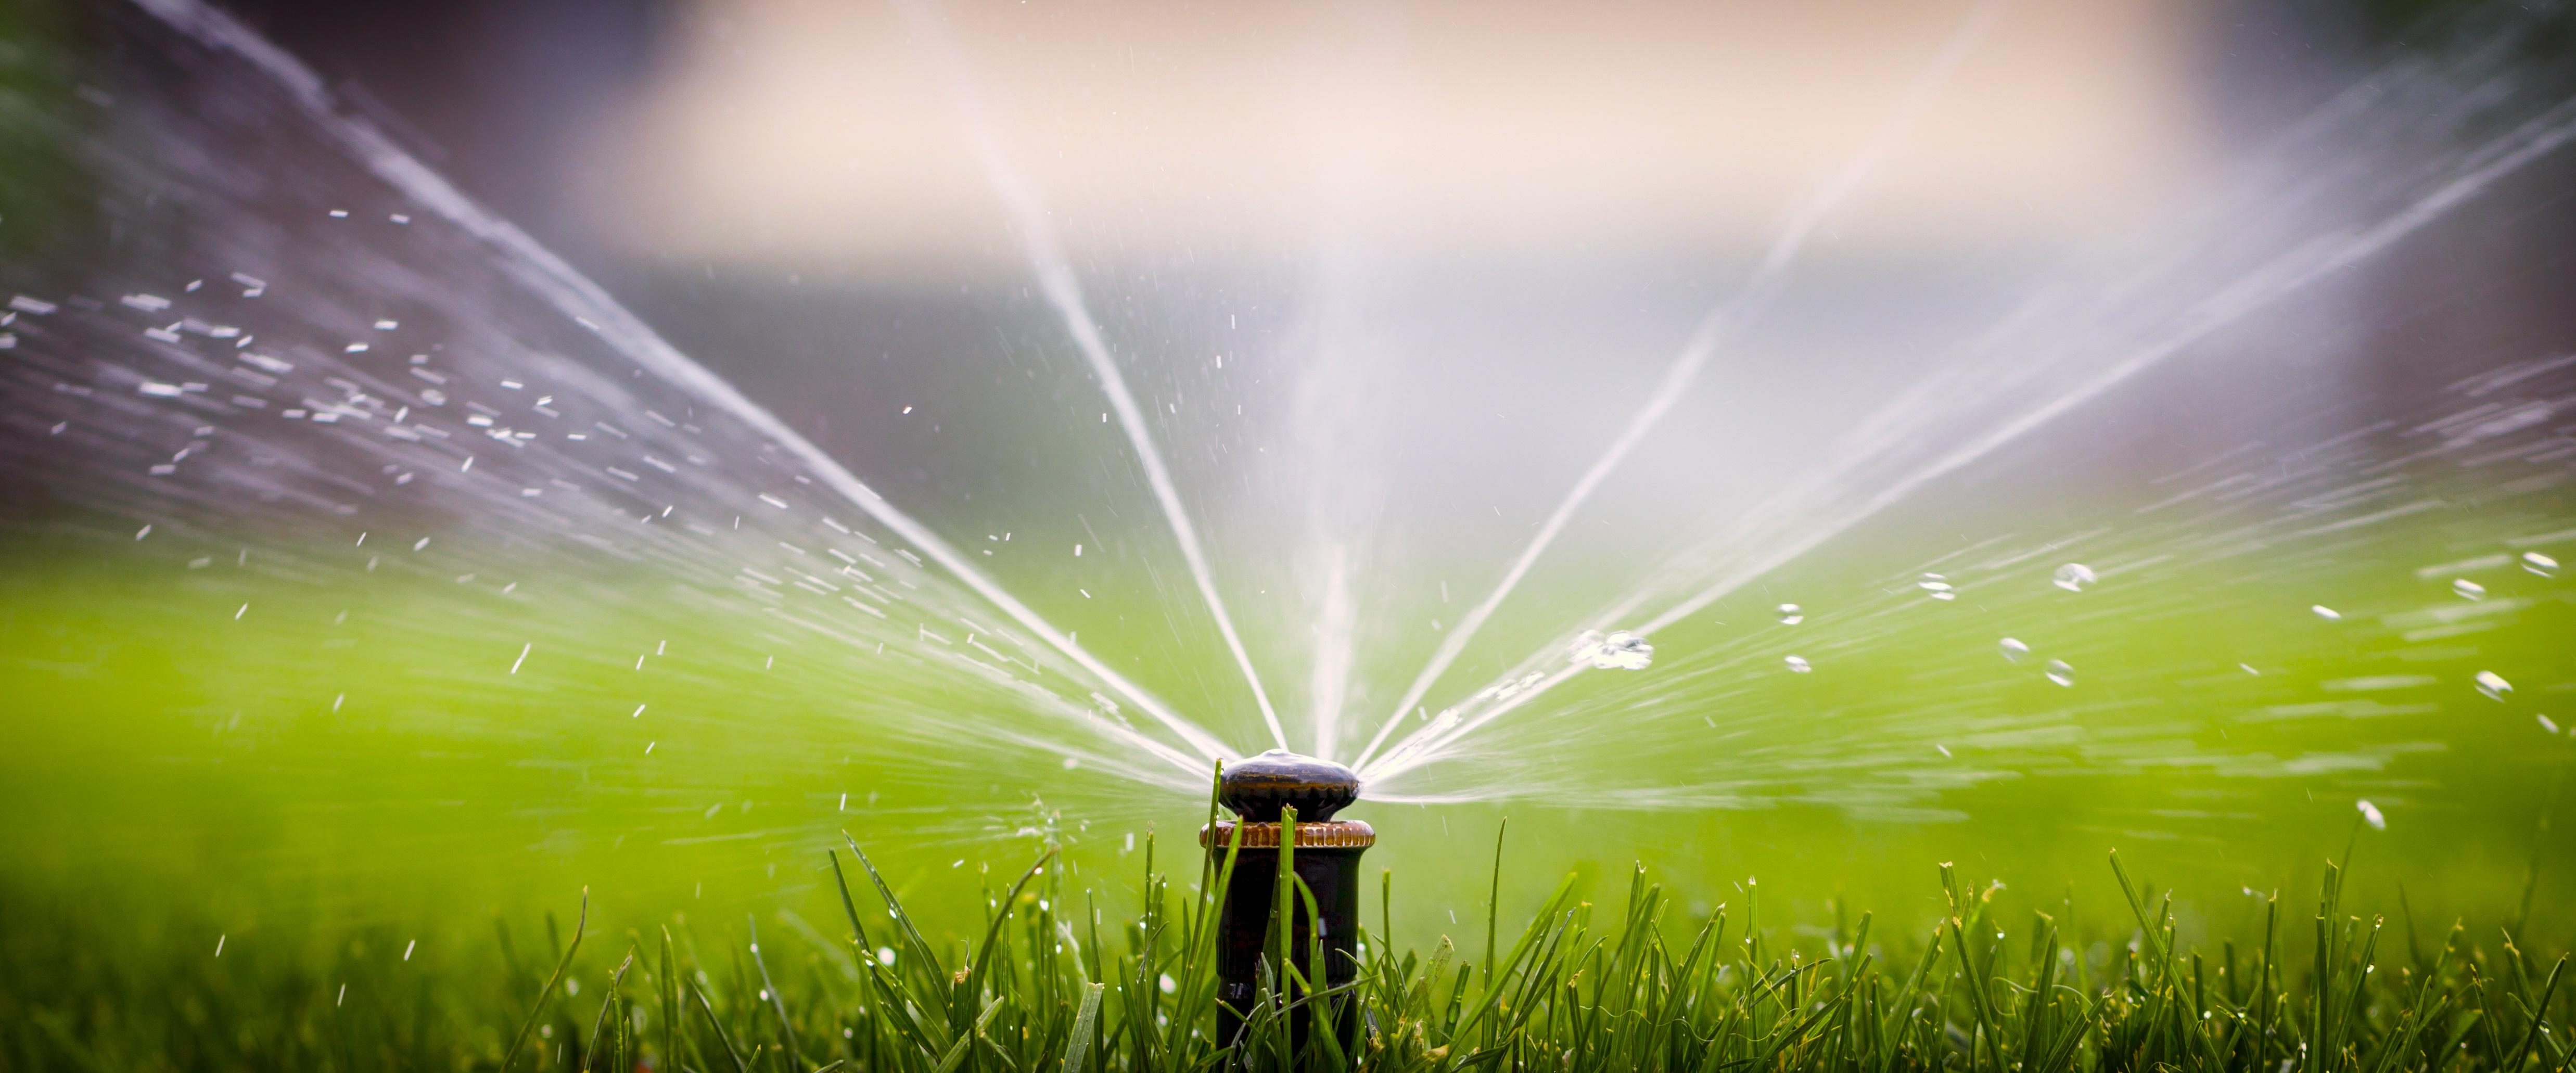 Lawn watering